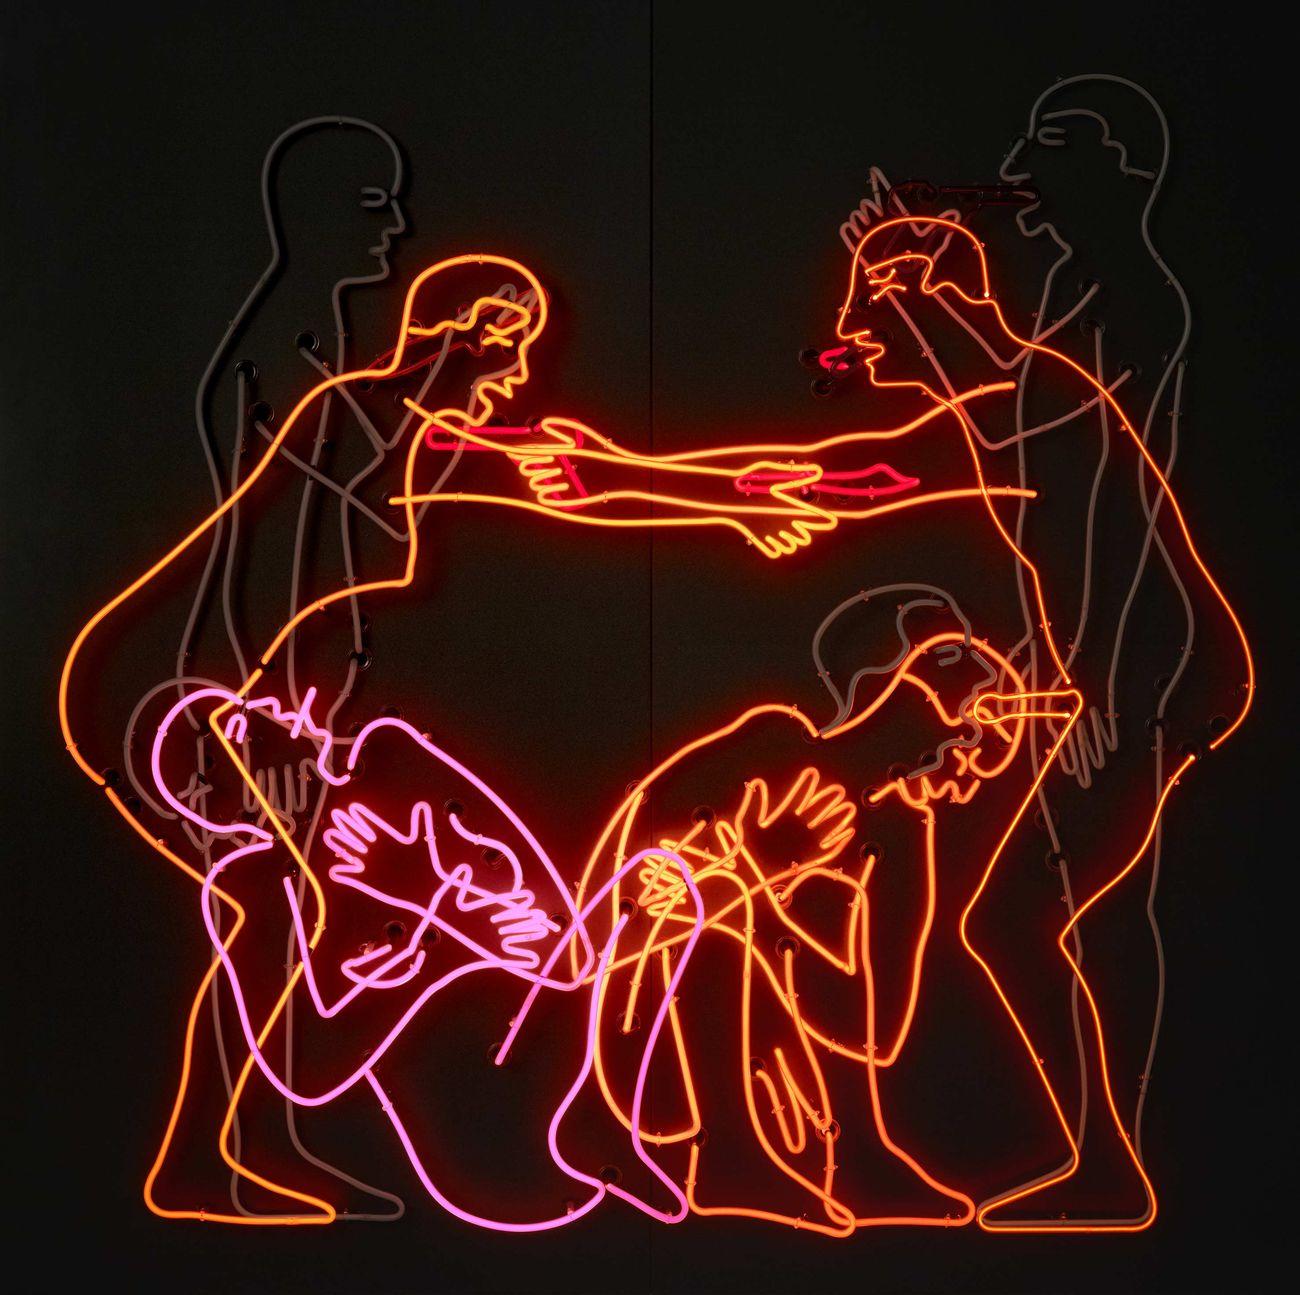 Bruce Nauman, Sex and Death by Murder and Suicide, 1985. Emanuel Hoffmann Foundation. Photo Bisig & Bayer, Basel, © Bruce Nauman - 2018, ProLitteris, Zurich